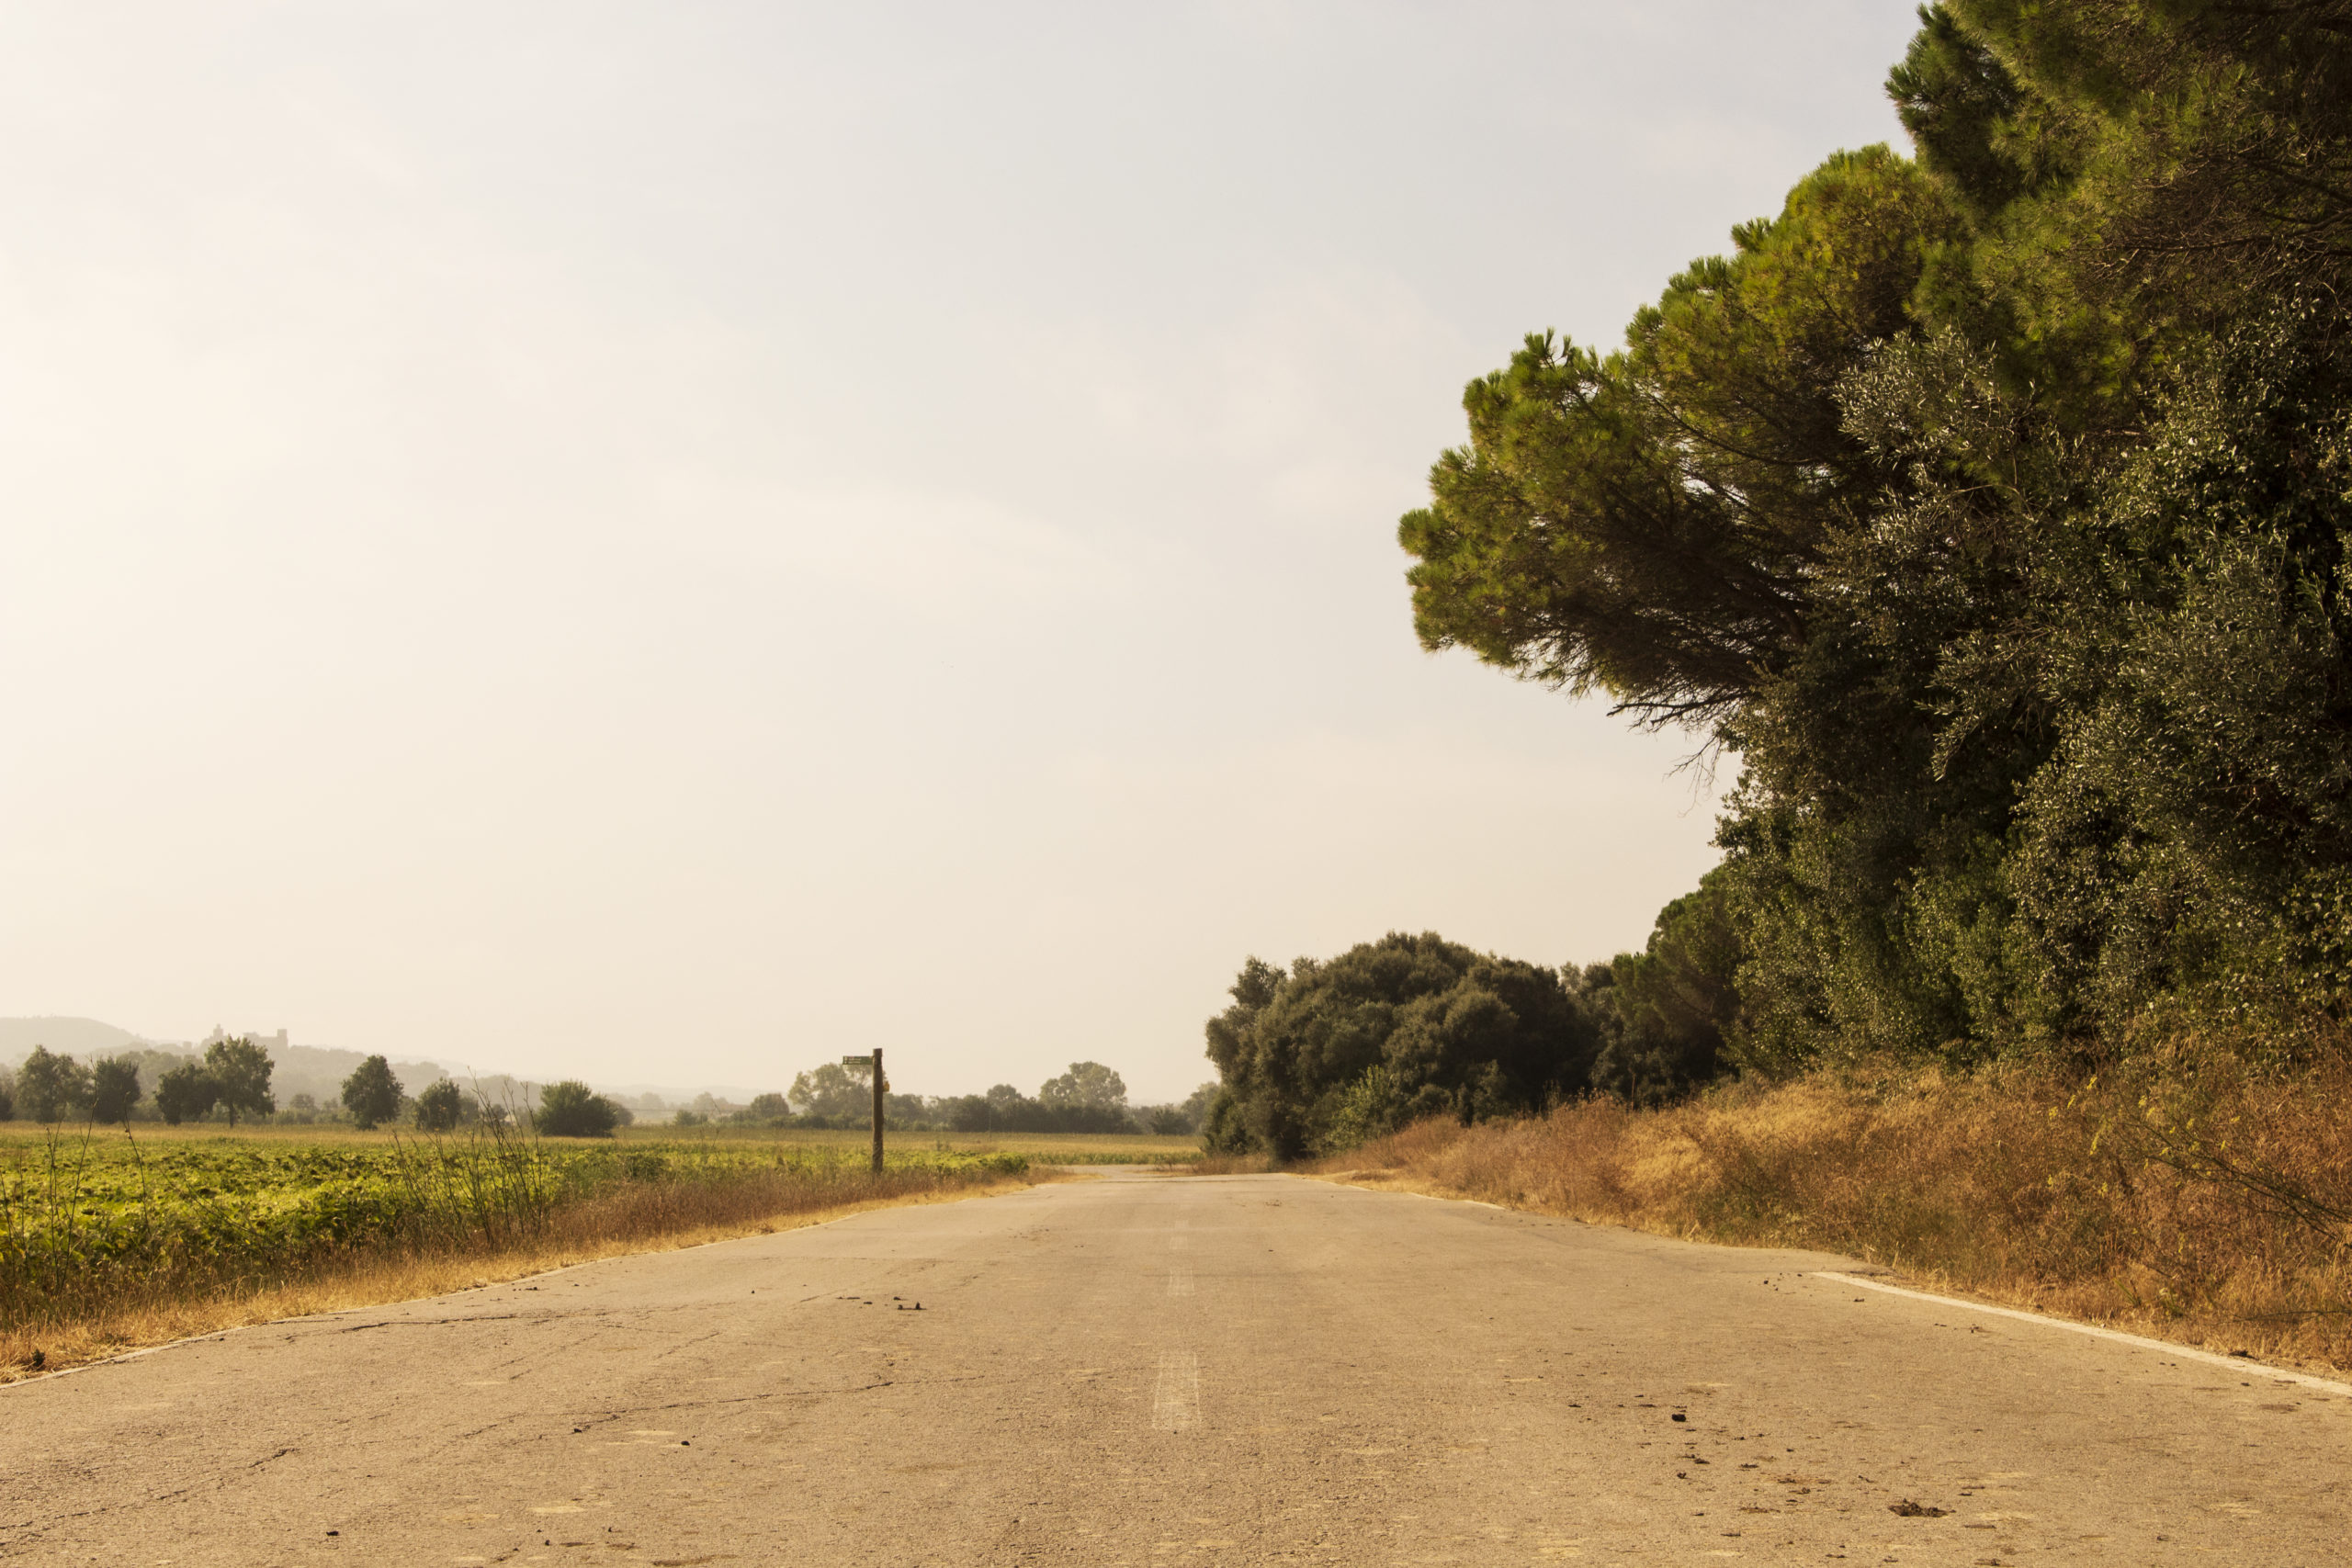 Carretera secundaria de Girona, Cataluña